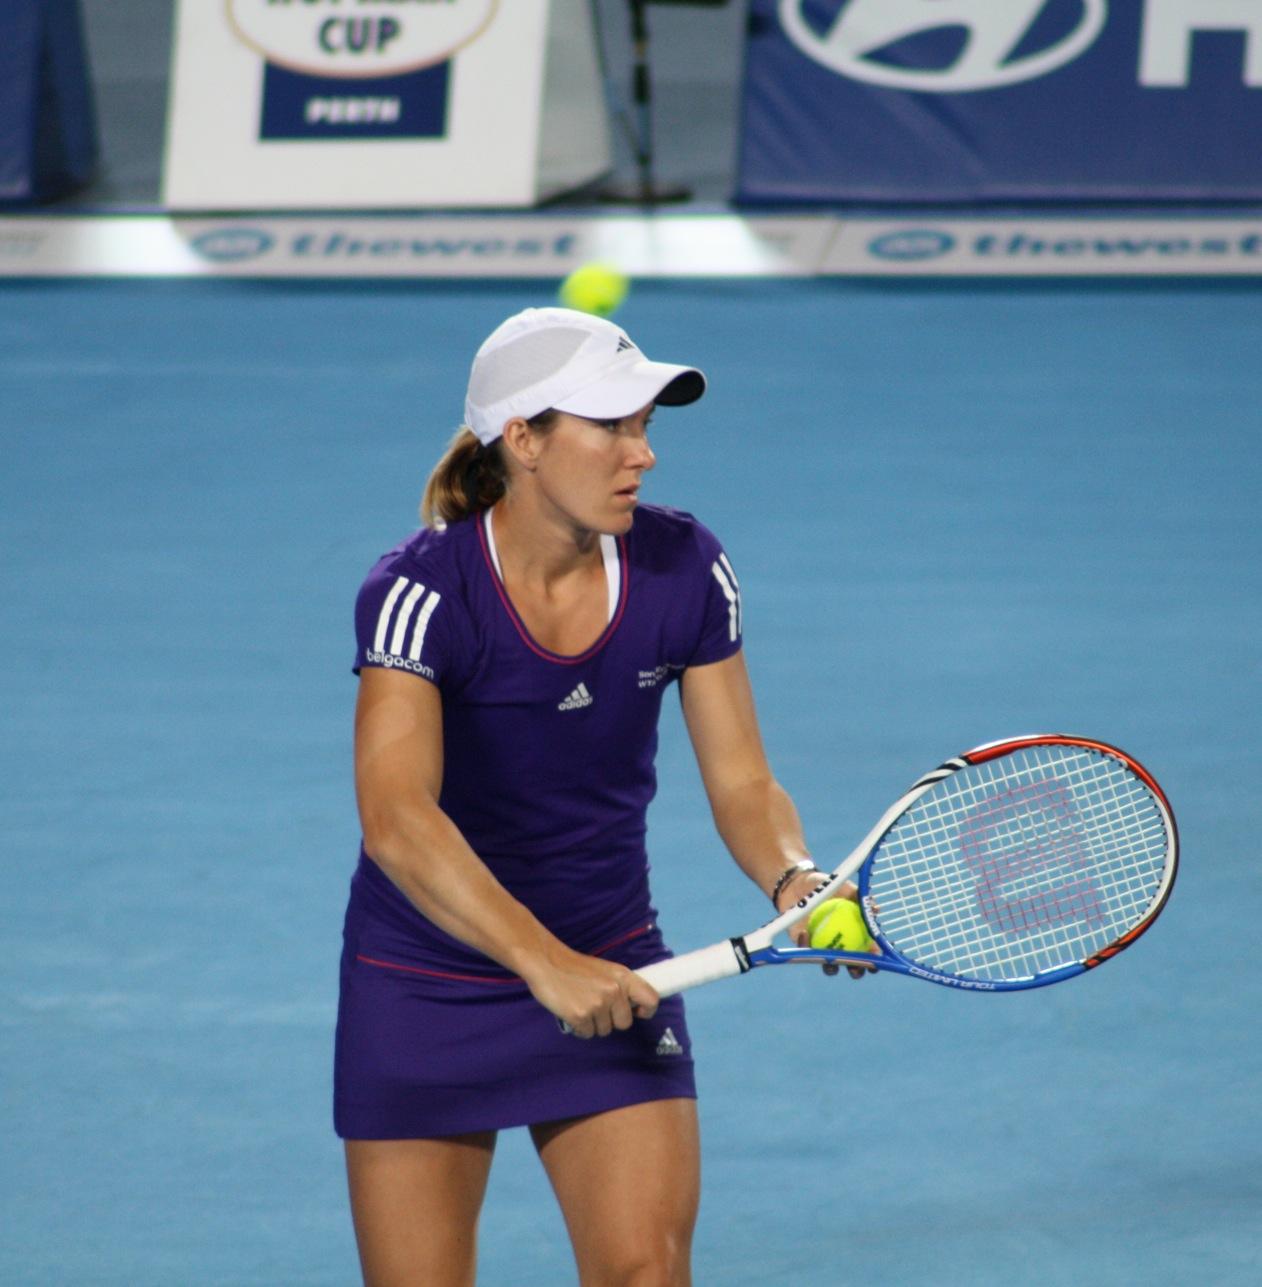 Justine Henin Female Tennis Star Biography & s 2011